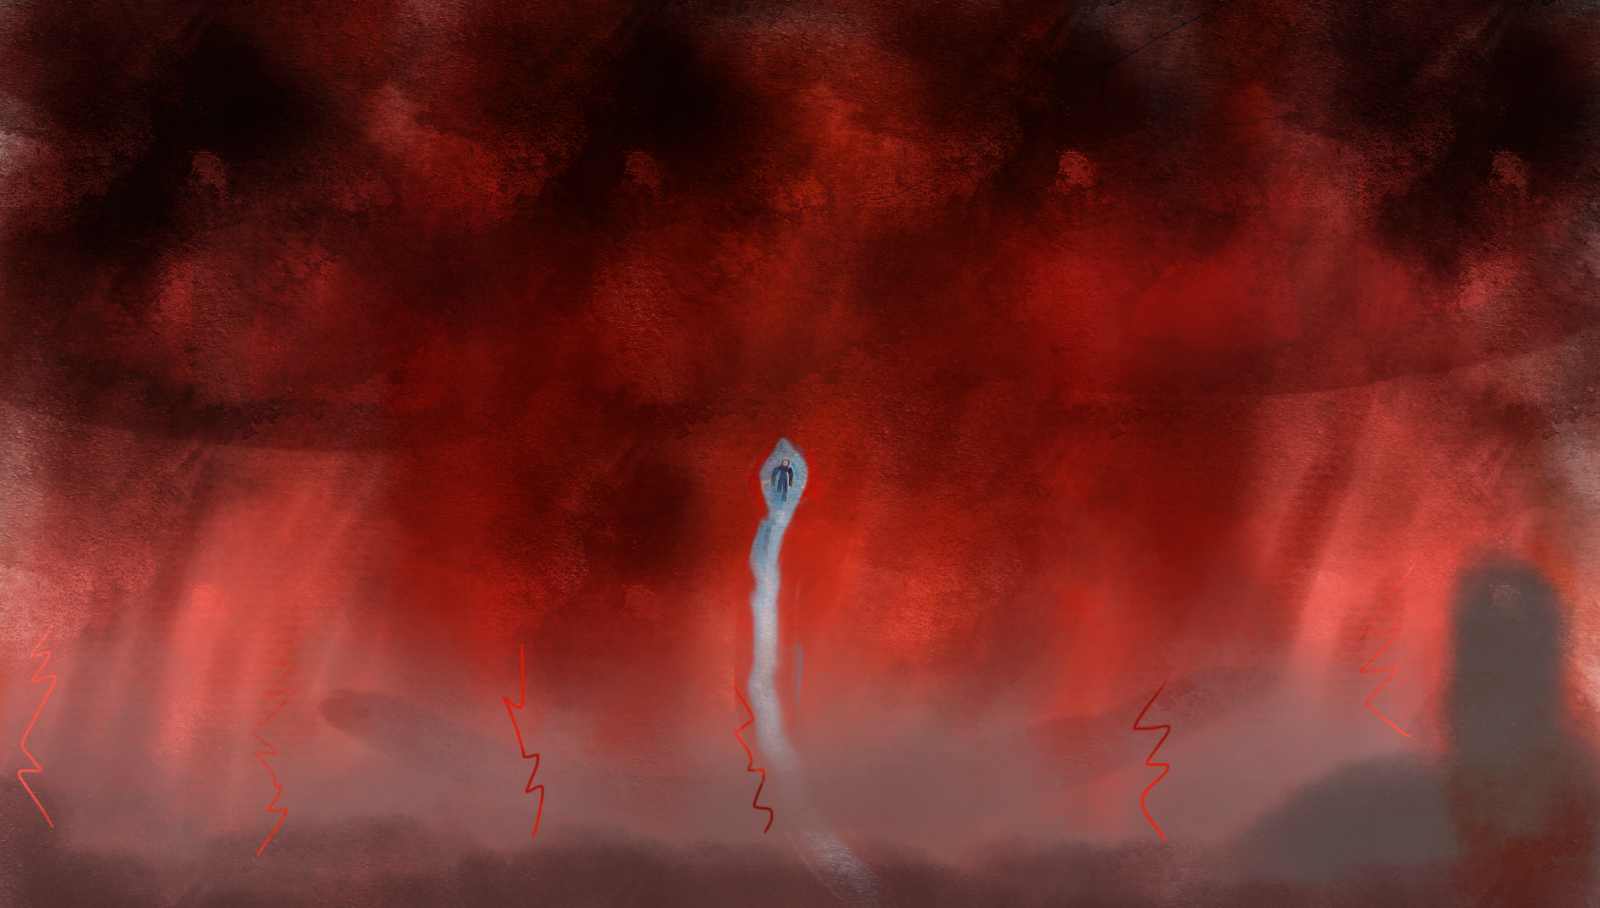 Kaladin vs. the Everstorm